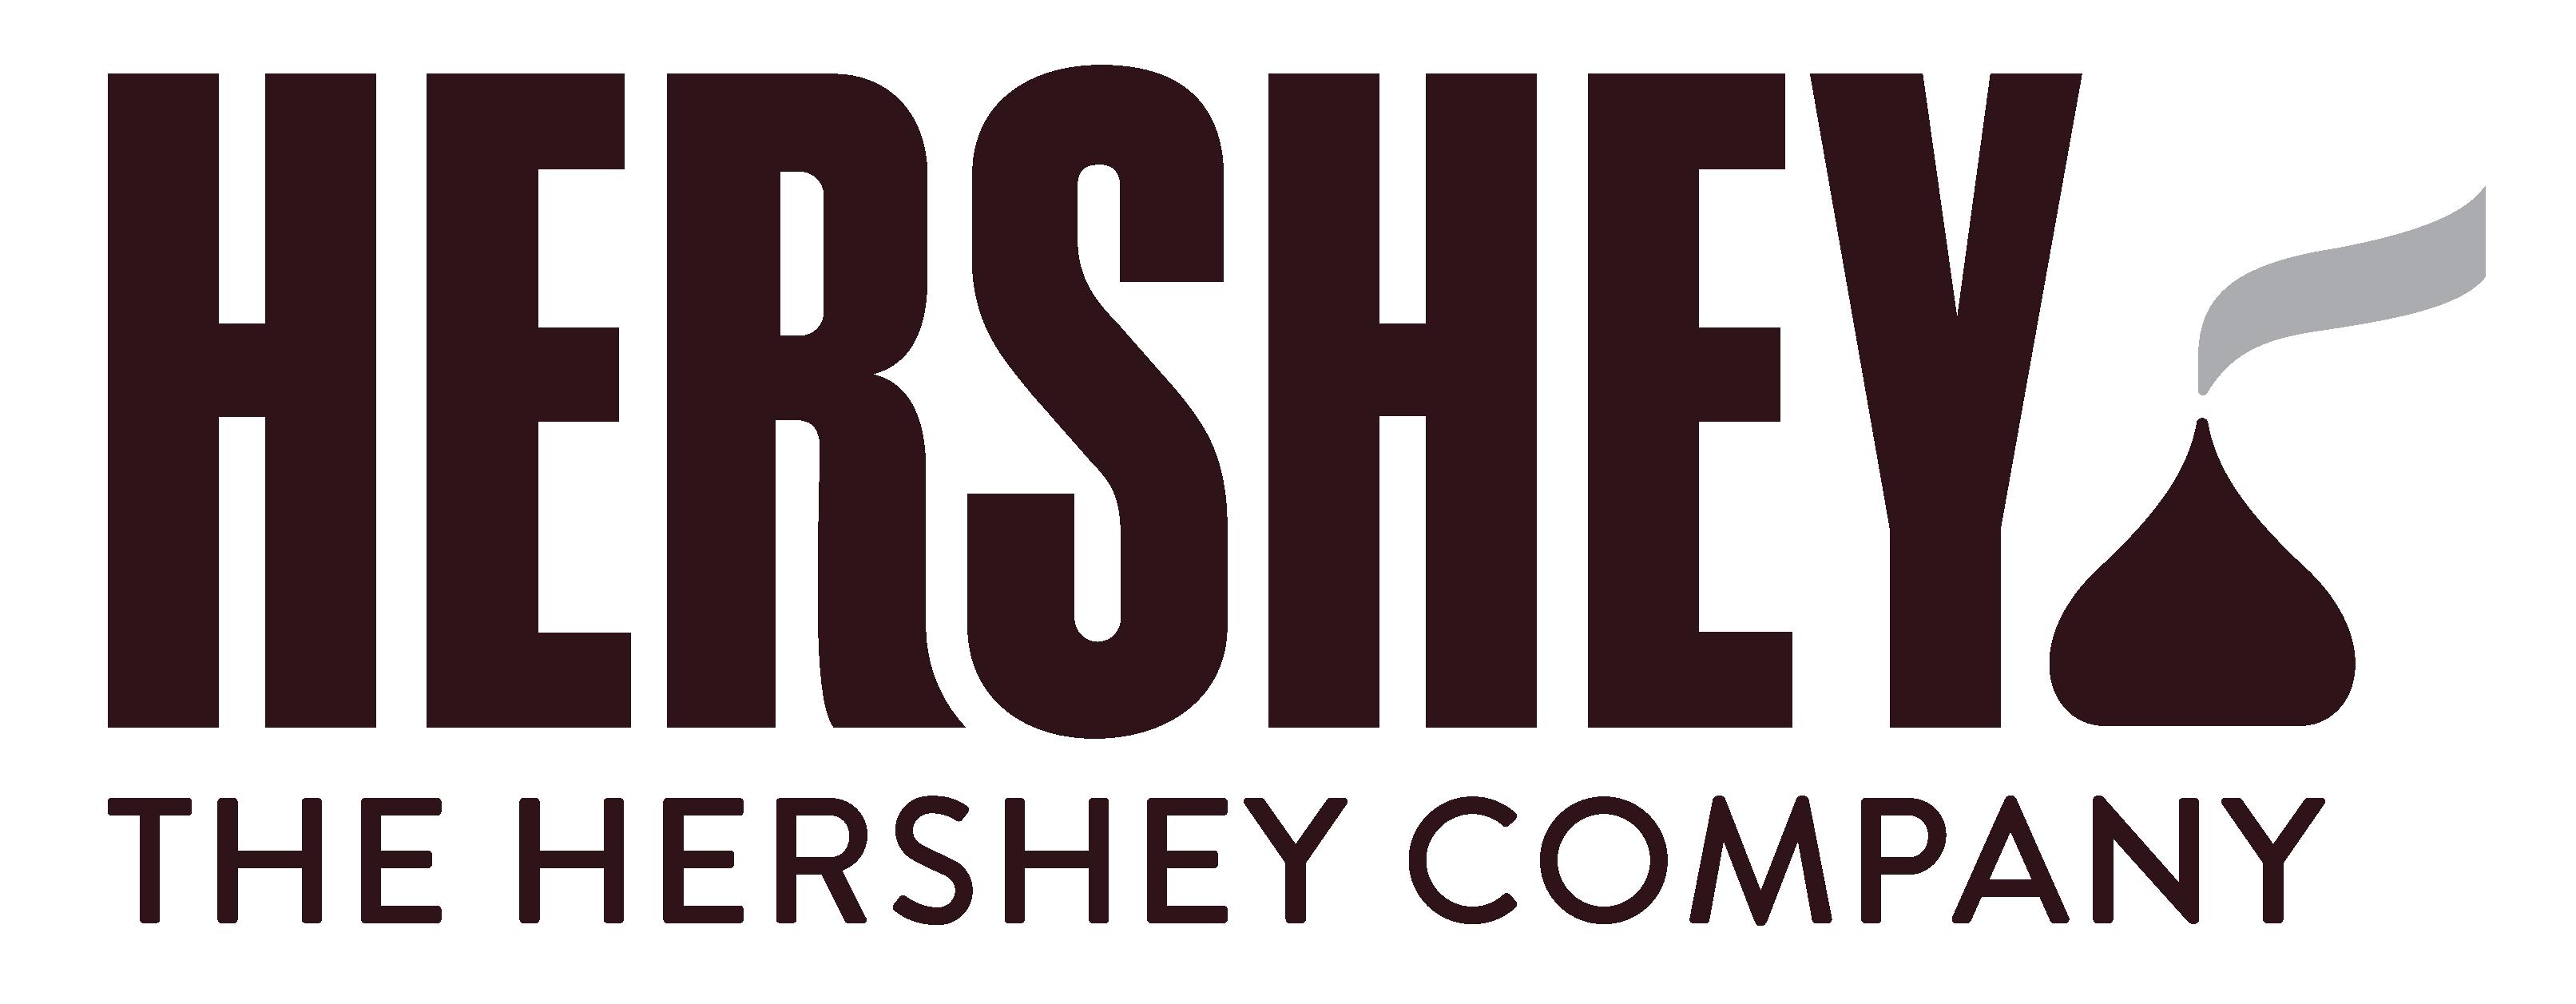 Hershey Logo - Rocket-Hire